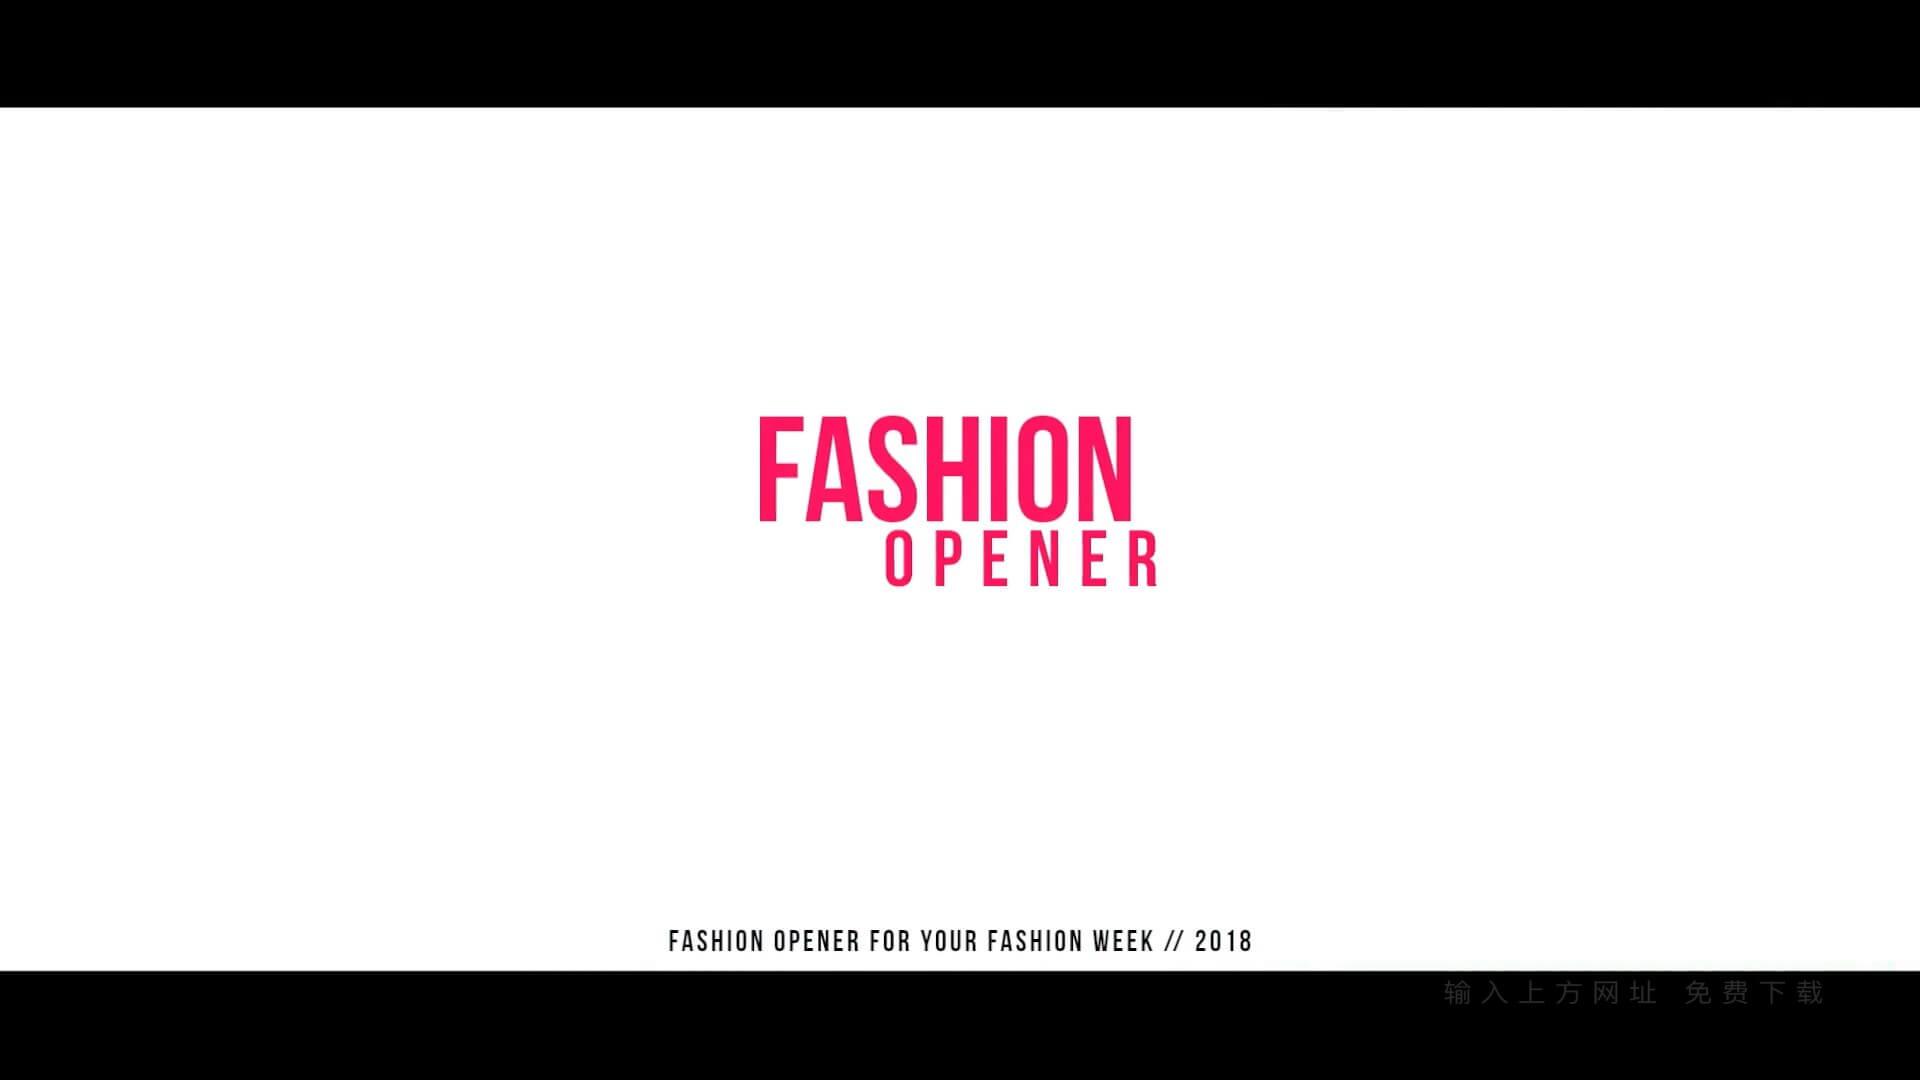 Fcpx主题模板 现代流行写真图文展示 motion模板 Fashion Opener